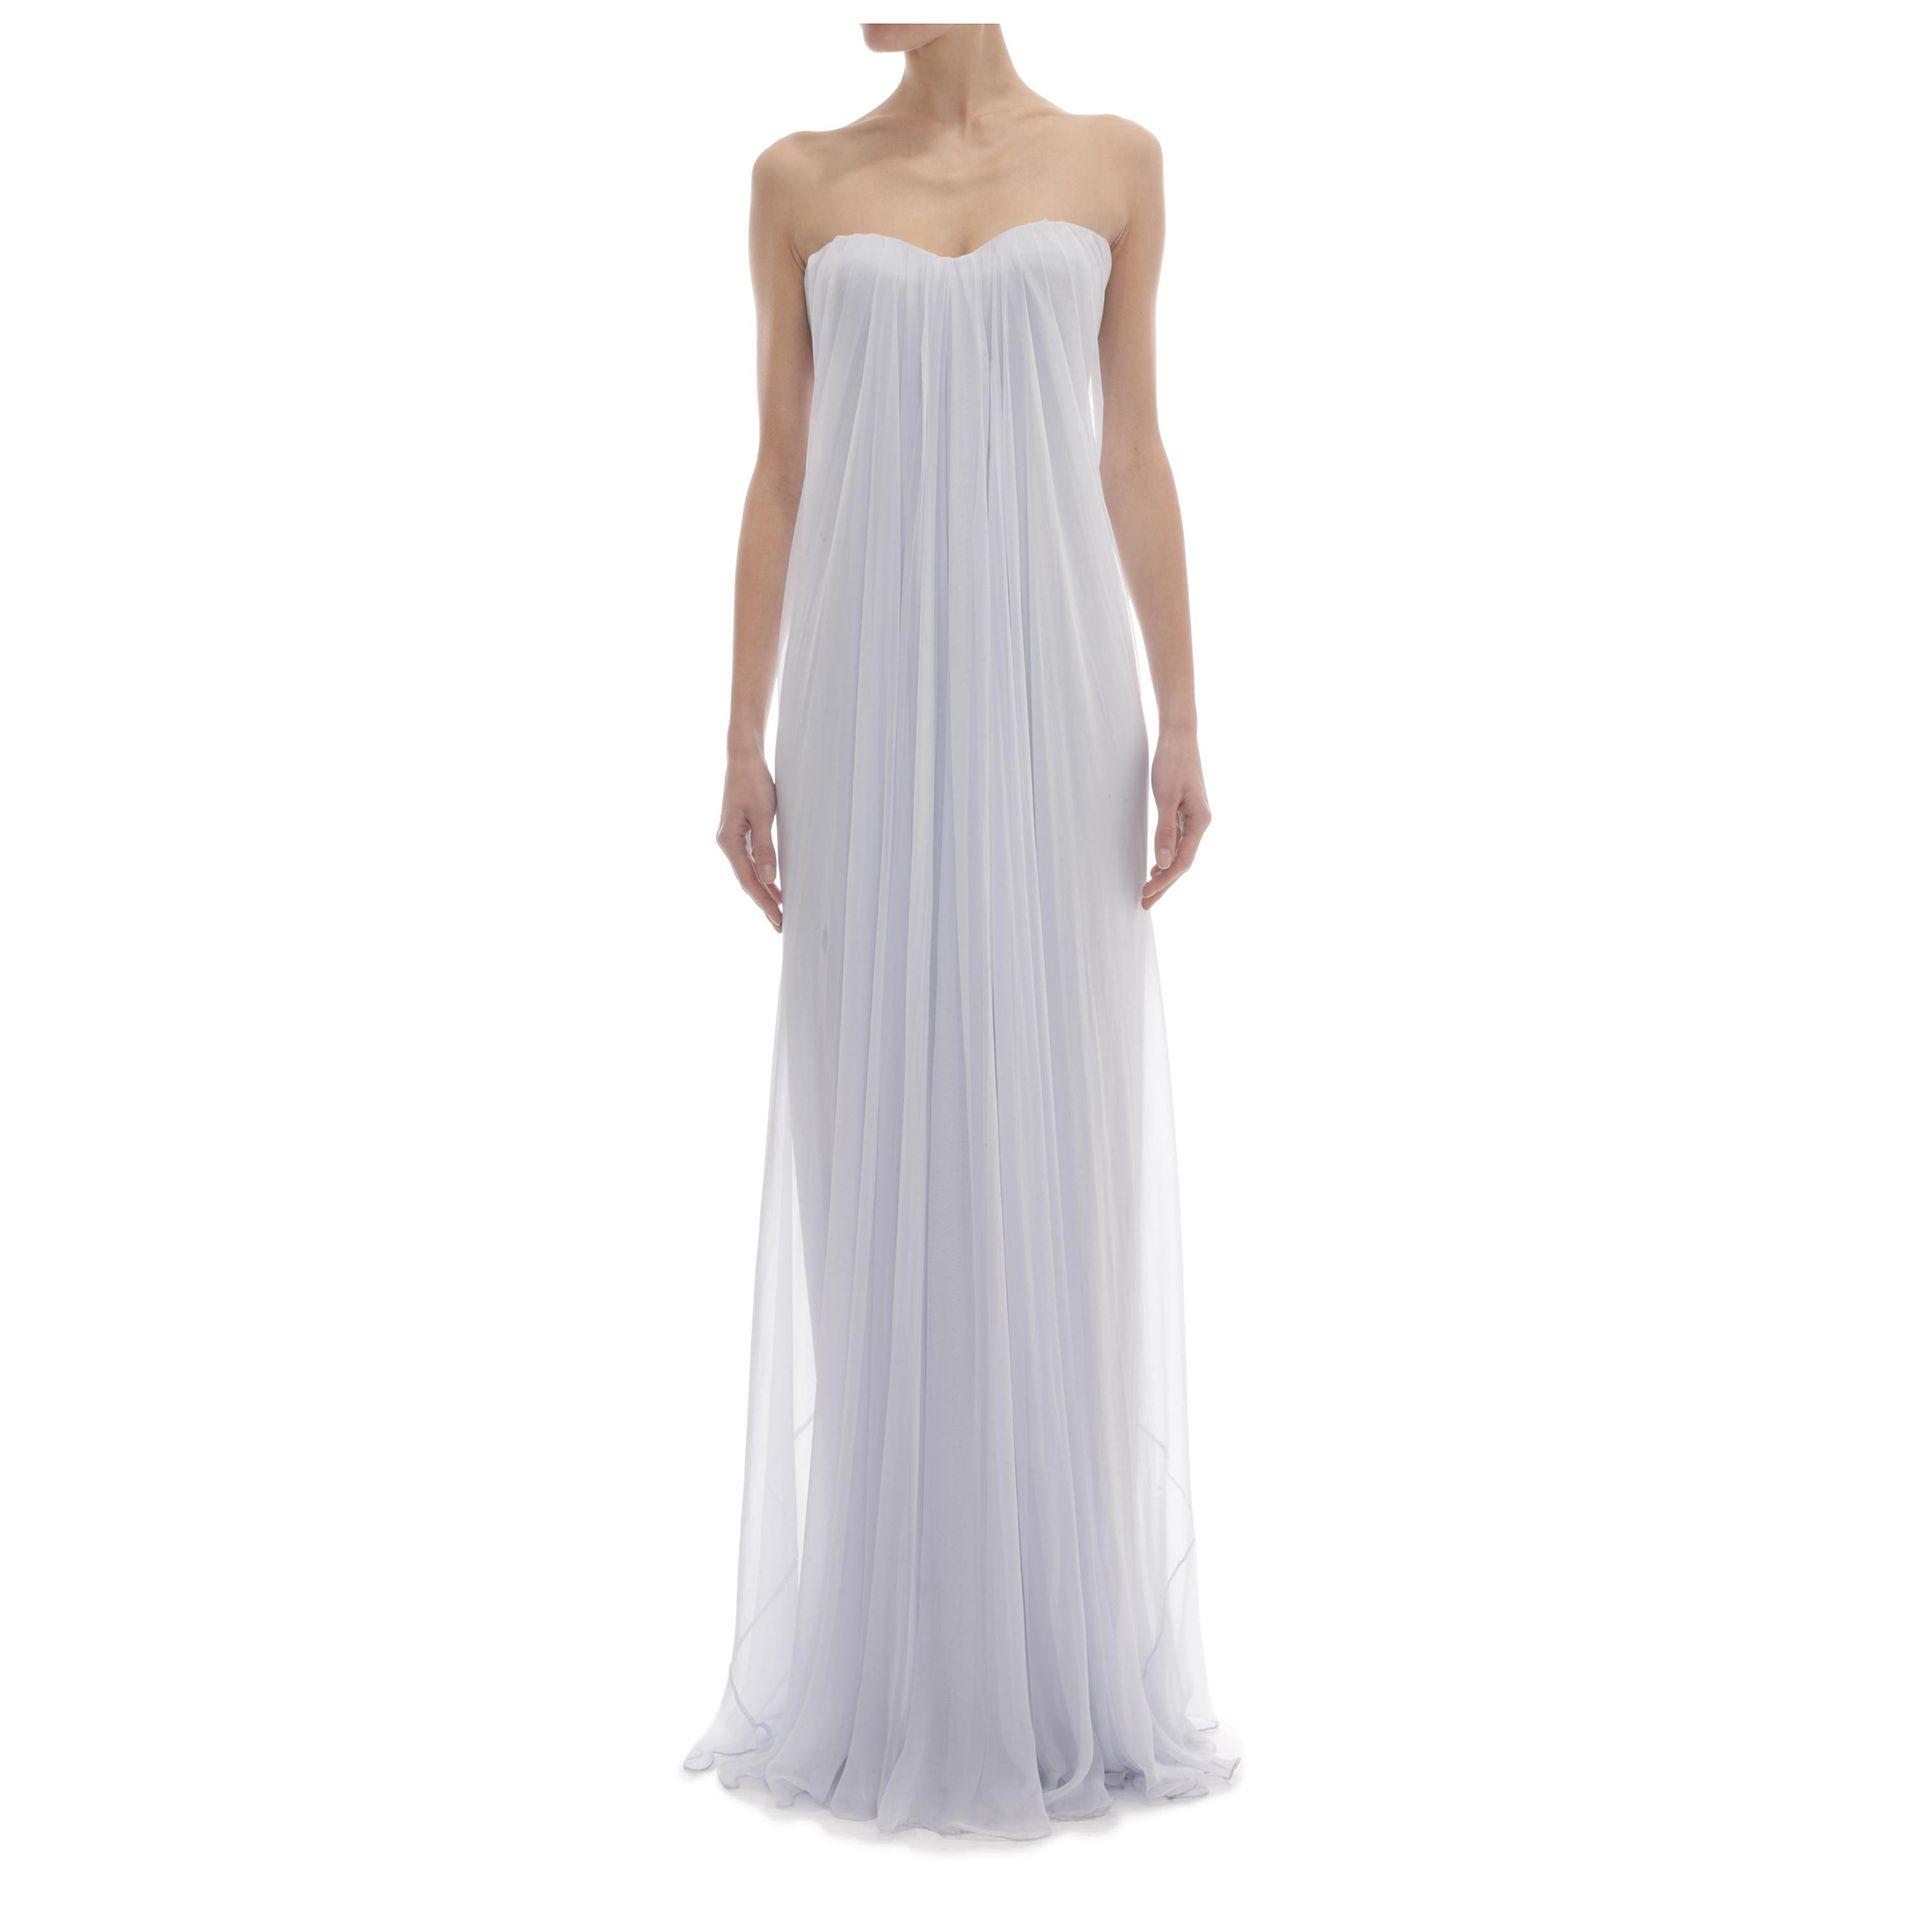 f14f1561801a5 Alexander McQueen Draped Bustier Gown in Blue - Lyst